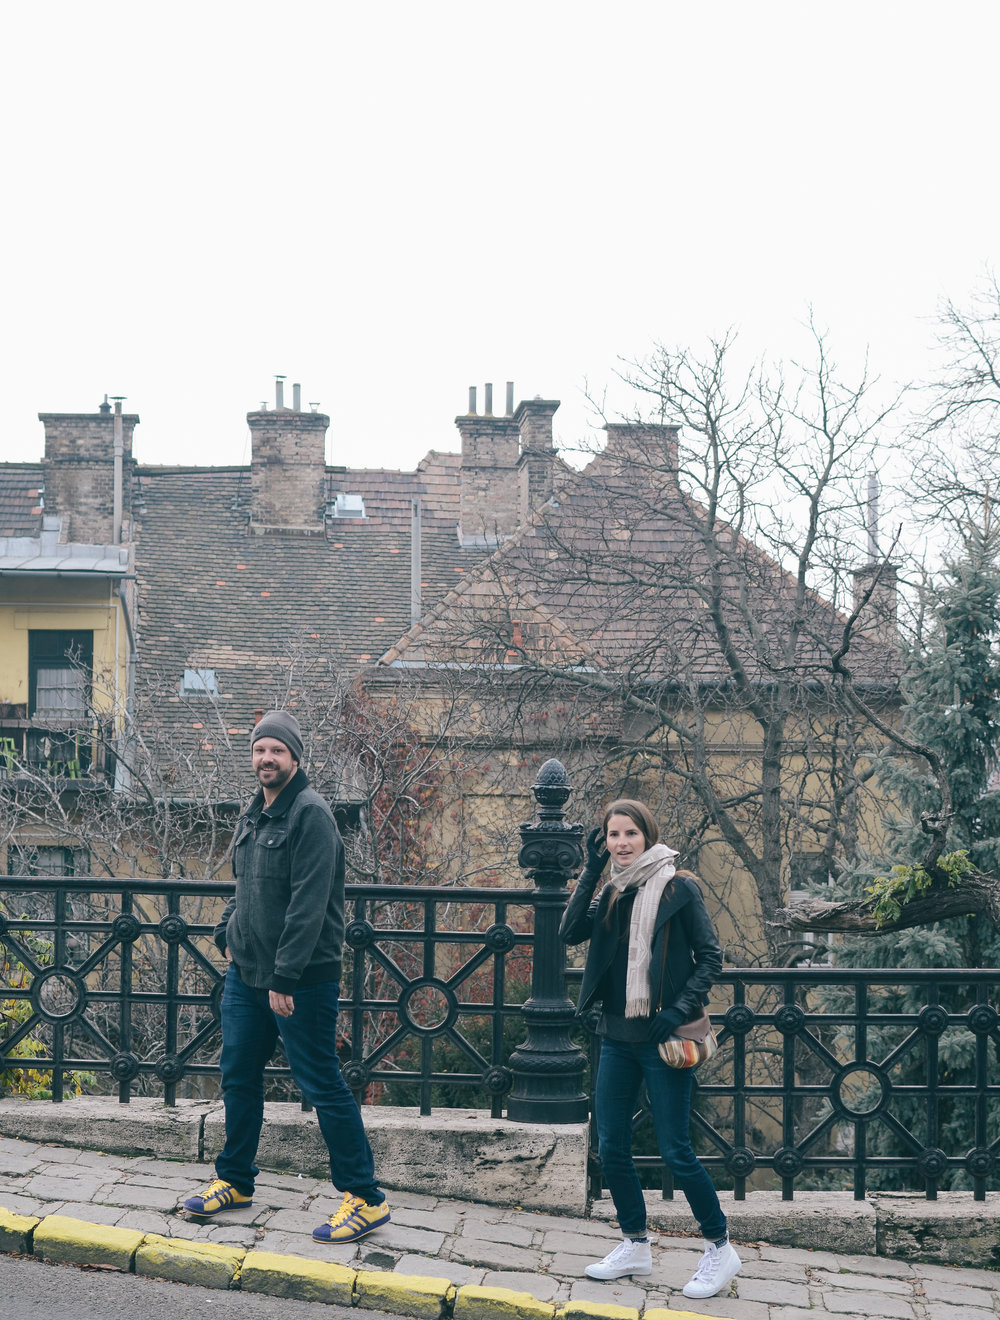 budapest-hungary-travel-guide-lifeonpine_DSC_0619.jpg